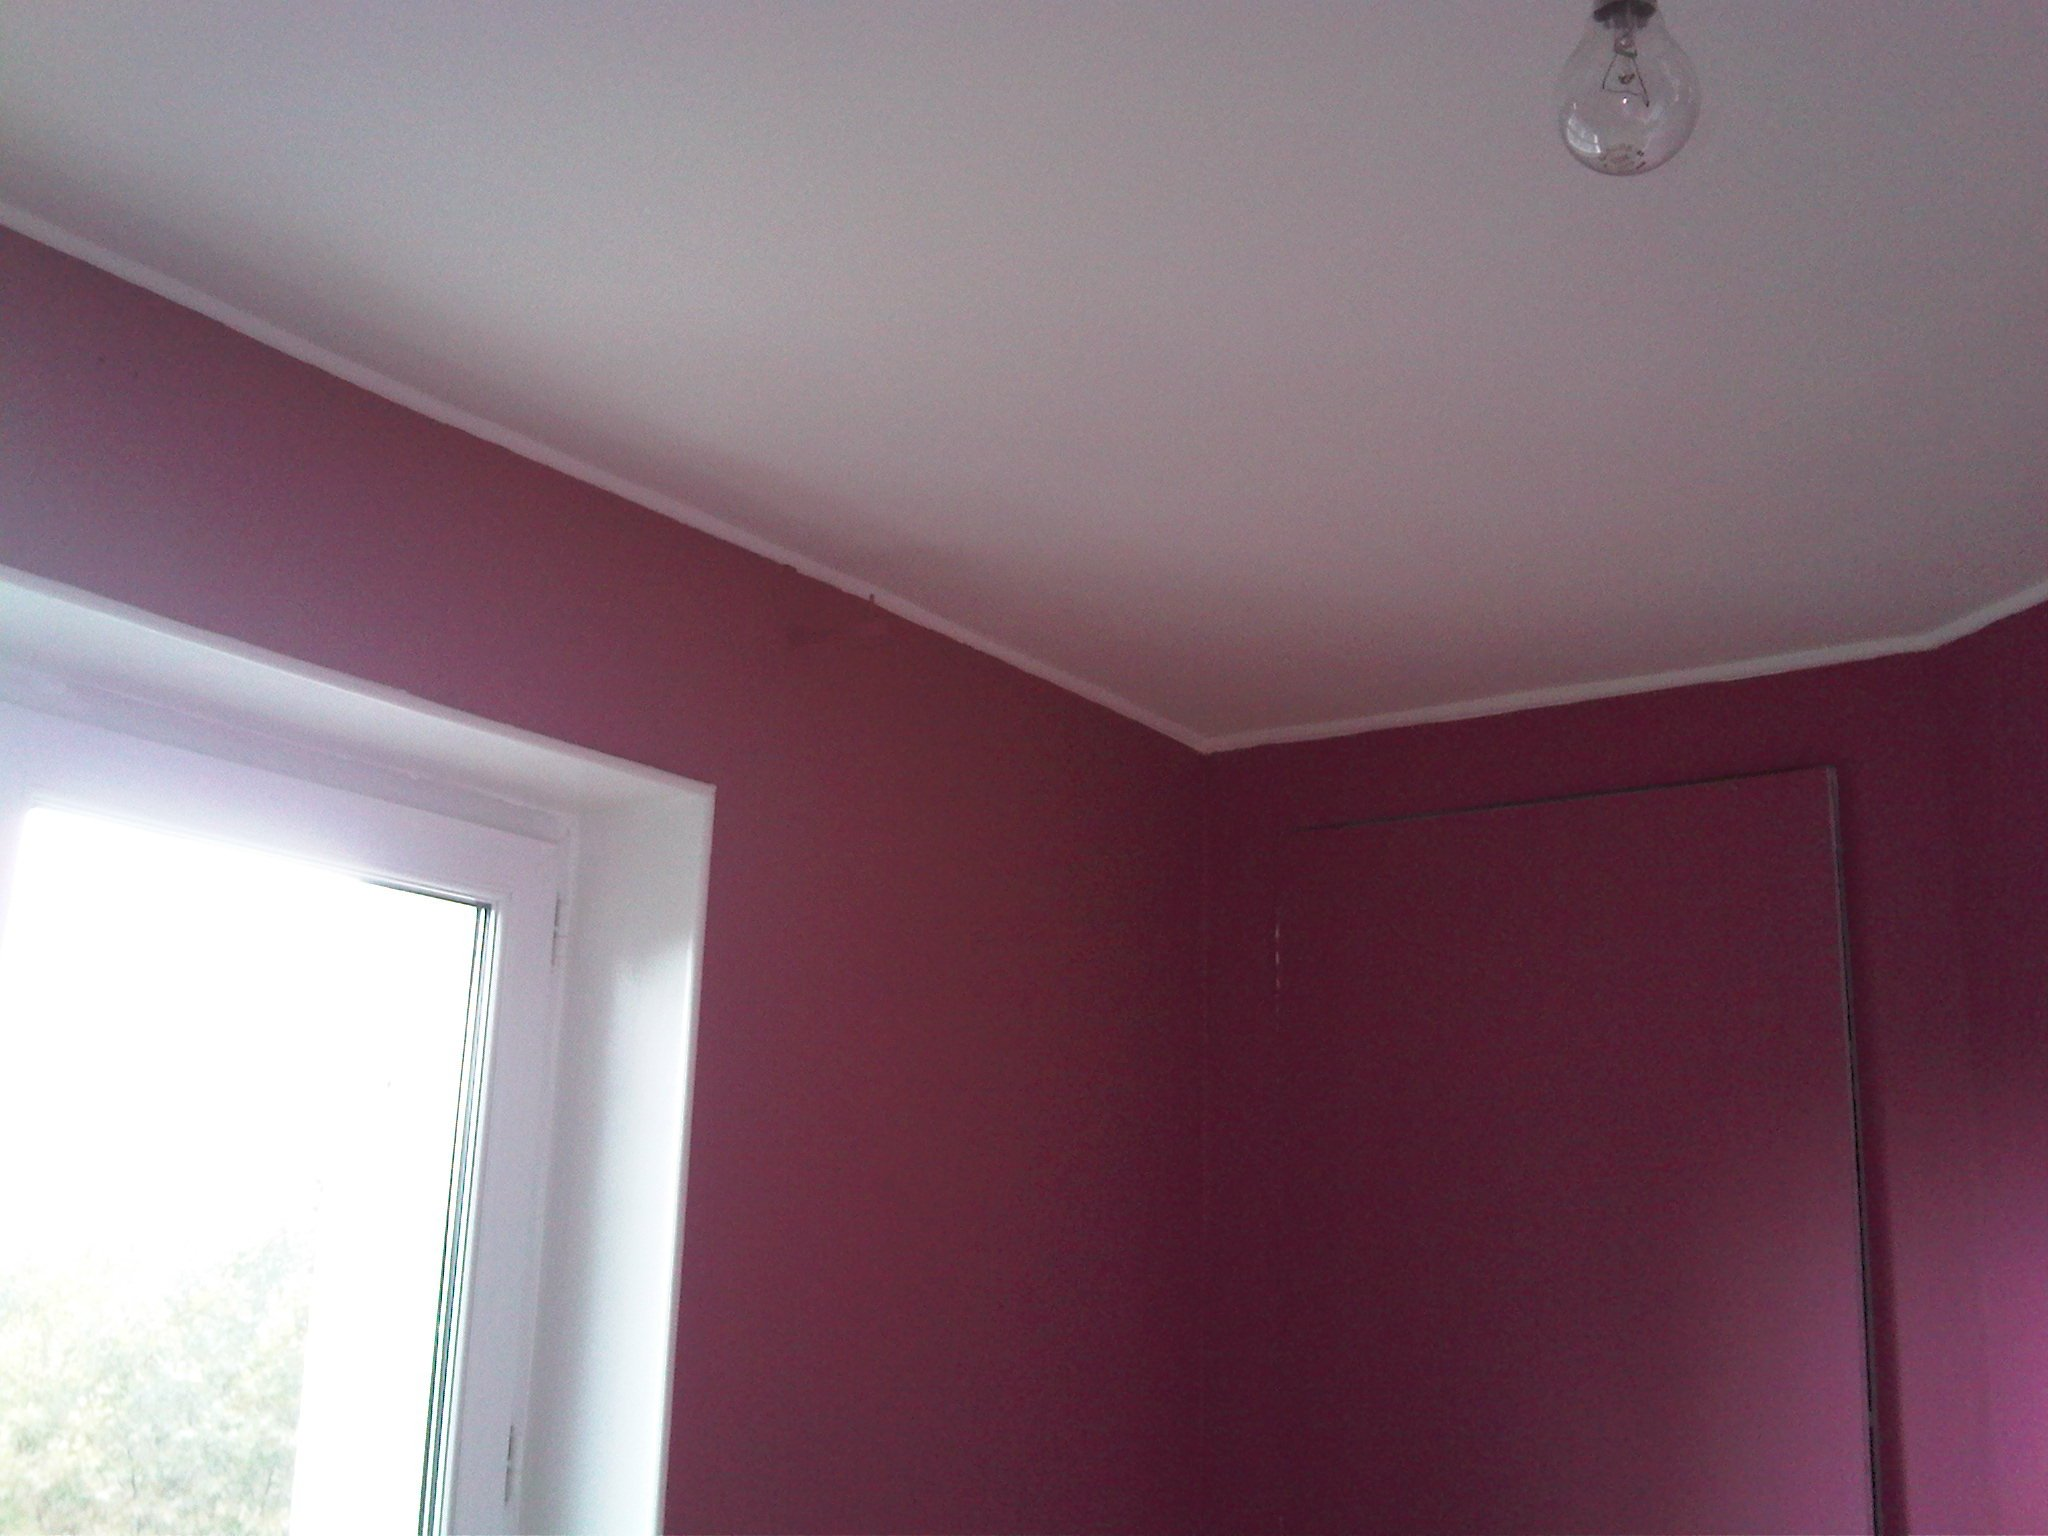 devis peinture studio devis peinture boutique 0613727706 renovex. Black Bedroom Furniture Sets. Home Design Ideas